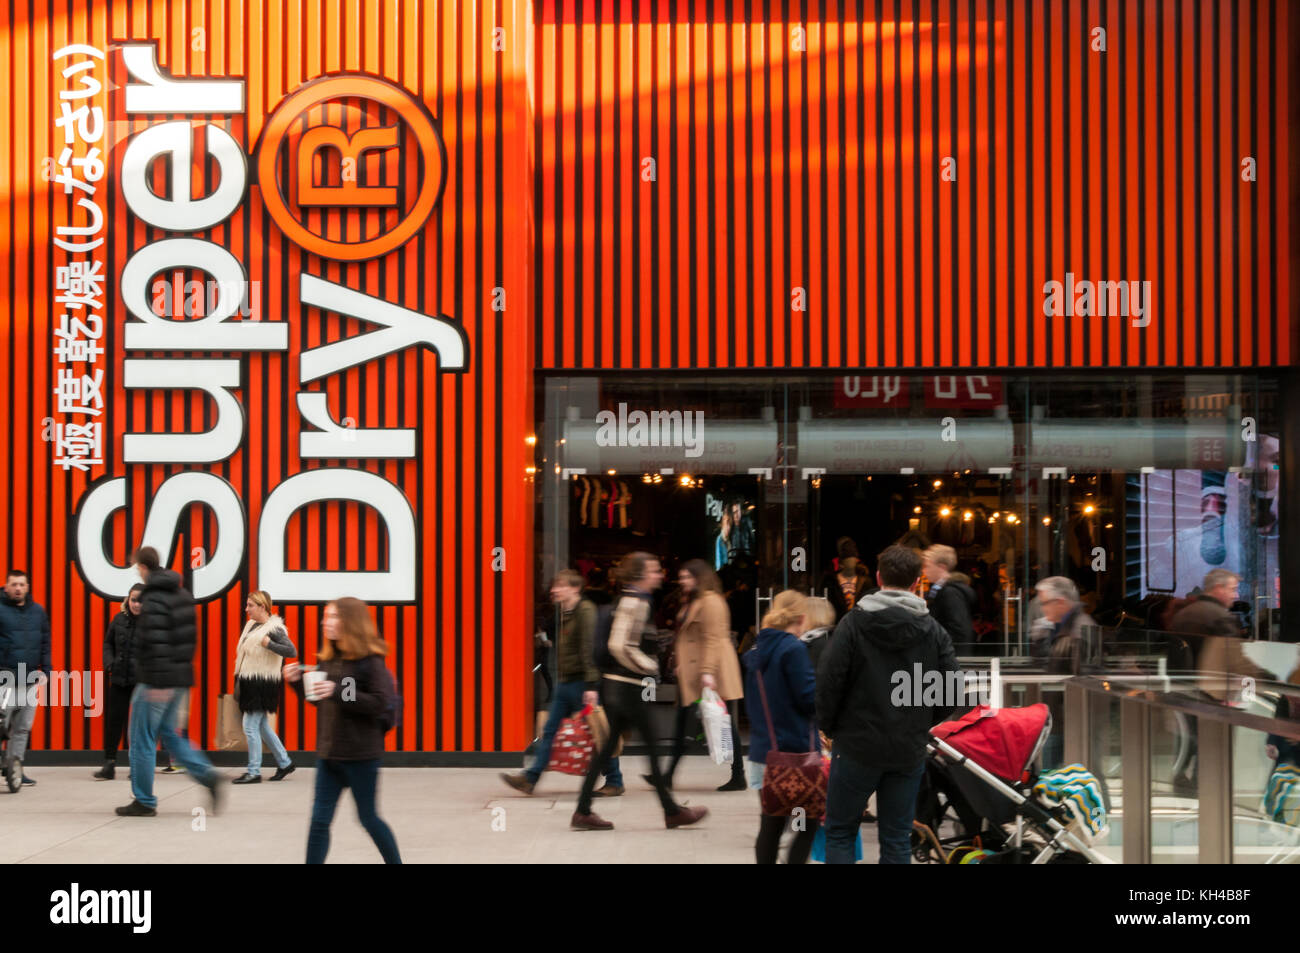 westgate-shopping-centre-oxford-united-kingdom-KH4B8F.jpg